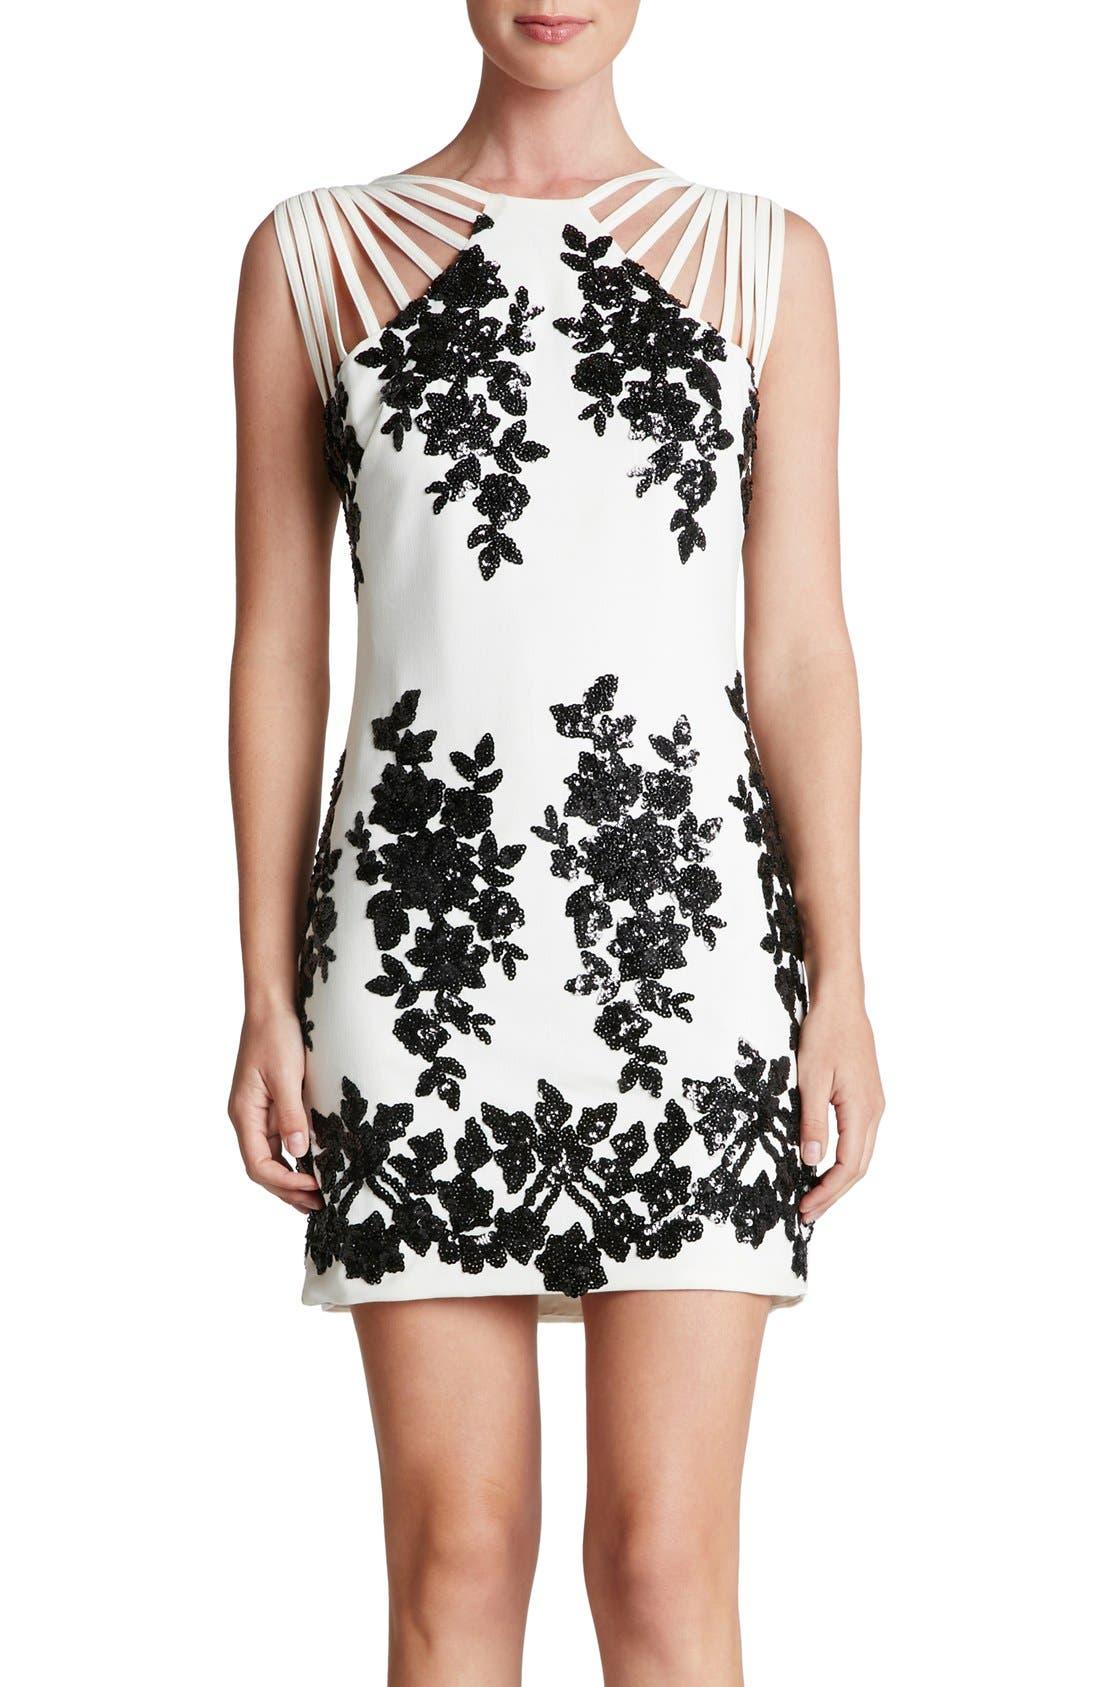 Alternate Image 1 Selected - Dress the Population 'Cora' Sequin Minidress